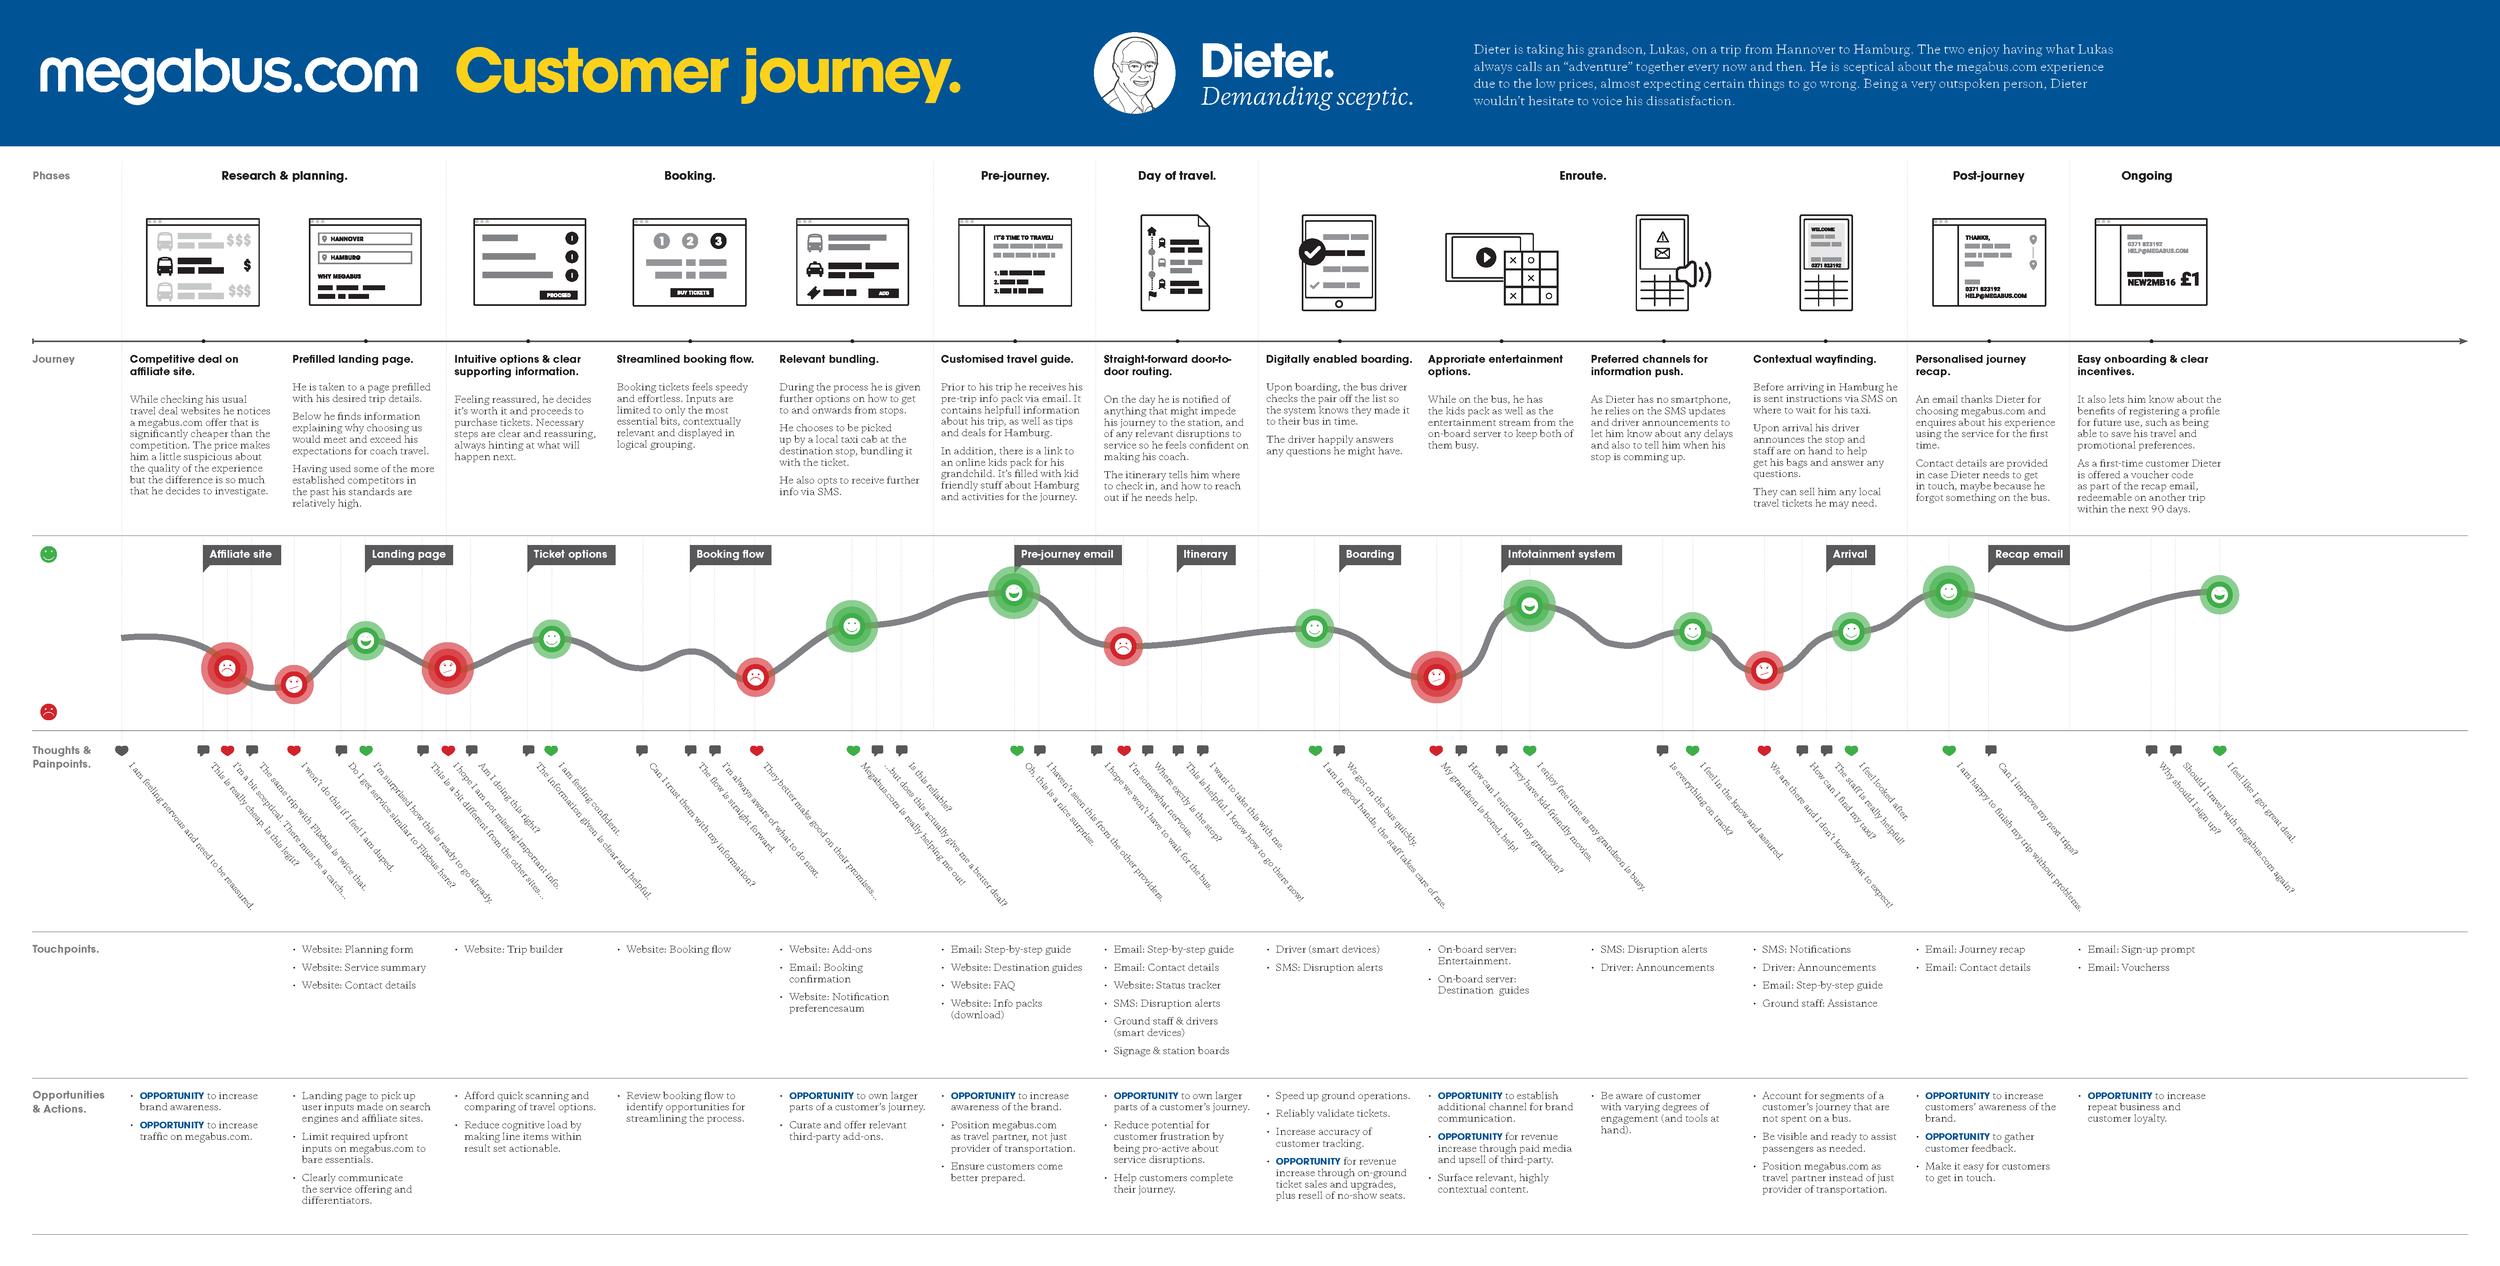 Customer journey map for Dieter, the Demanding Sceptic